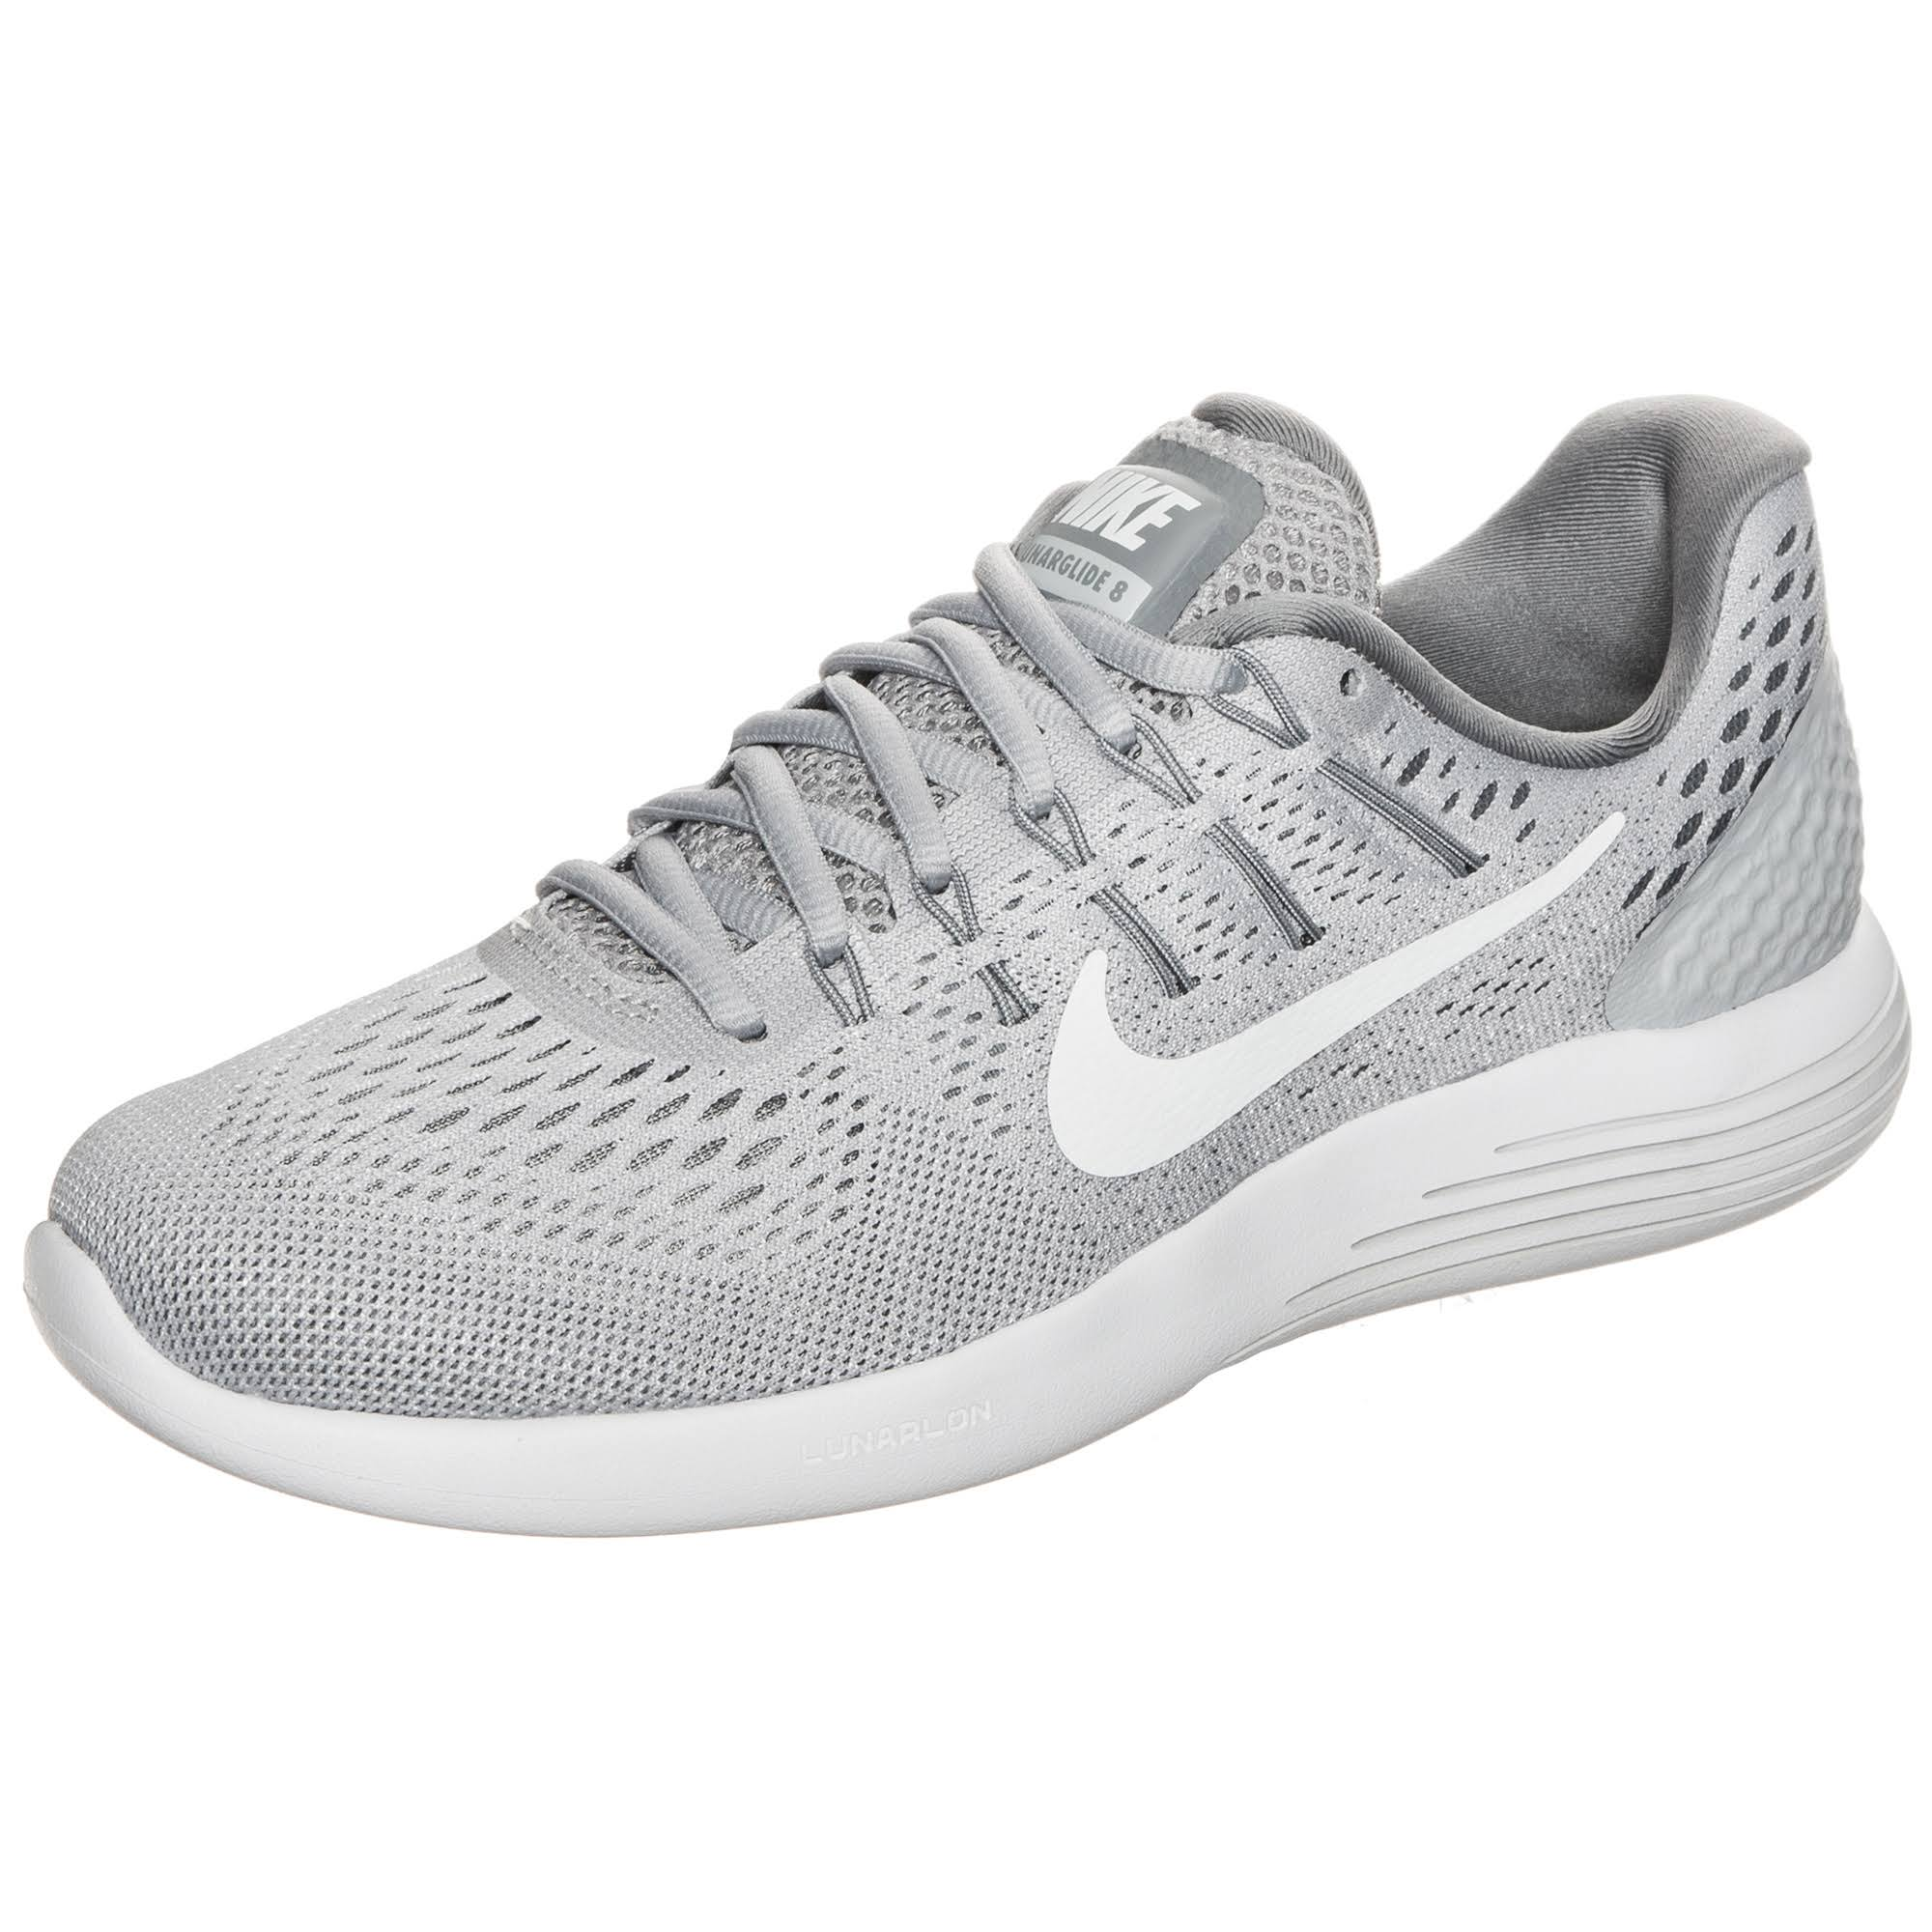 In Silber 5 8 Nike Größe Damen 38 Laufschuhe Lunarglide qwO07